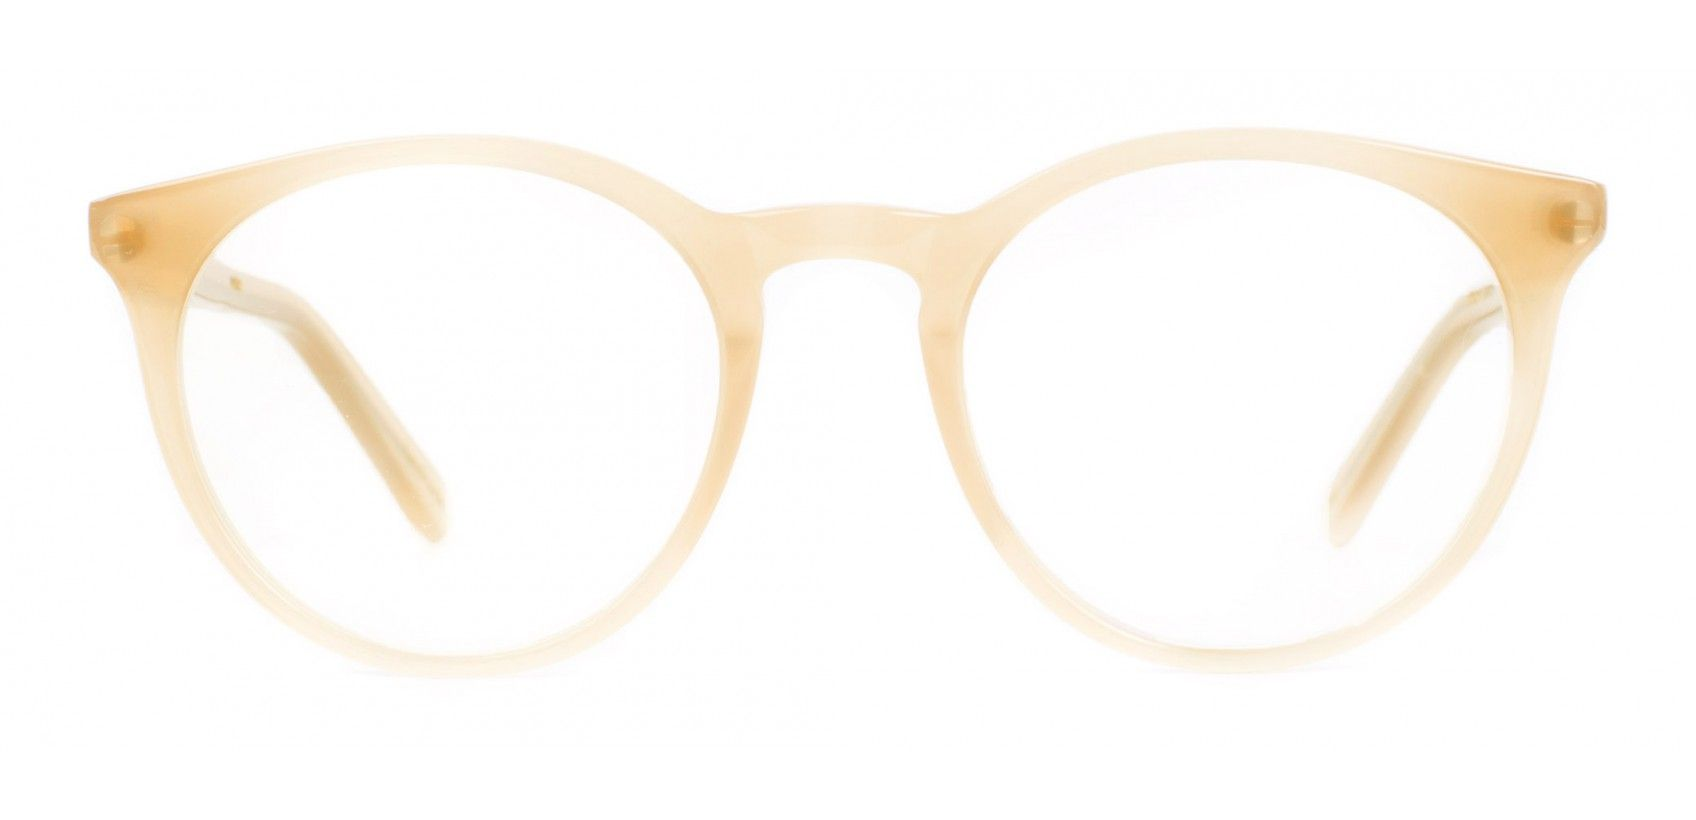 Easton Desert Camel Cream retro glasses - ace & tate #springtype #lentetype